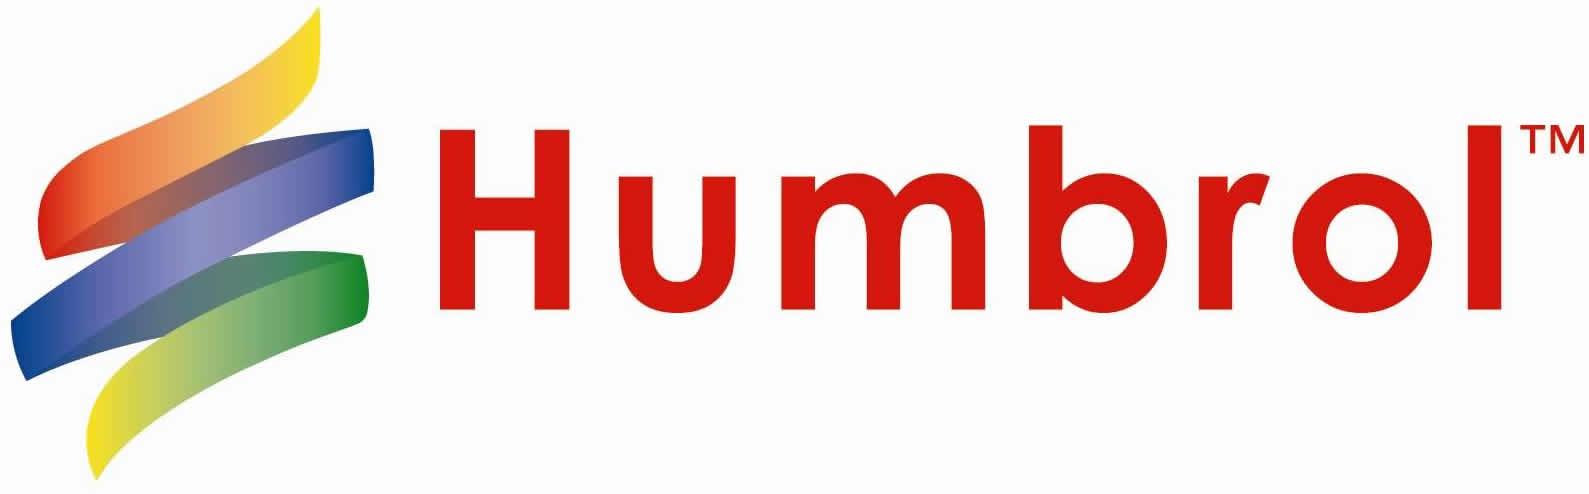 Humbrol Logo